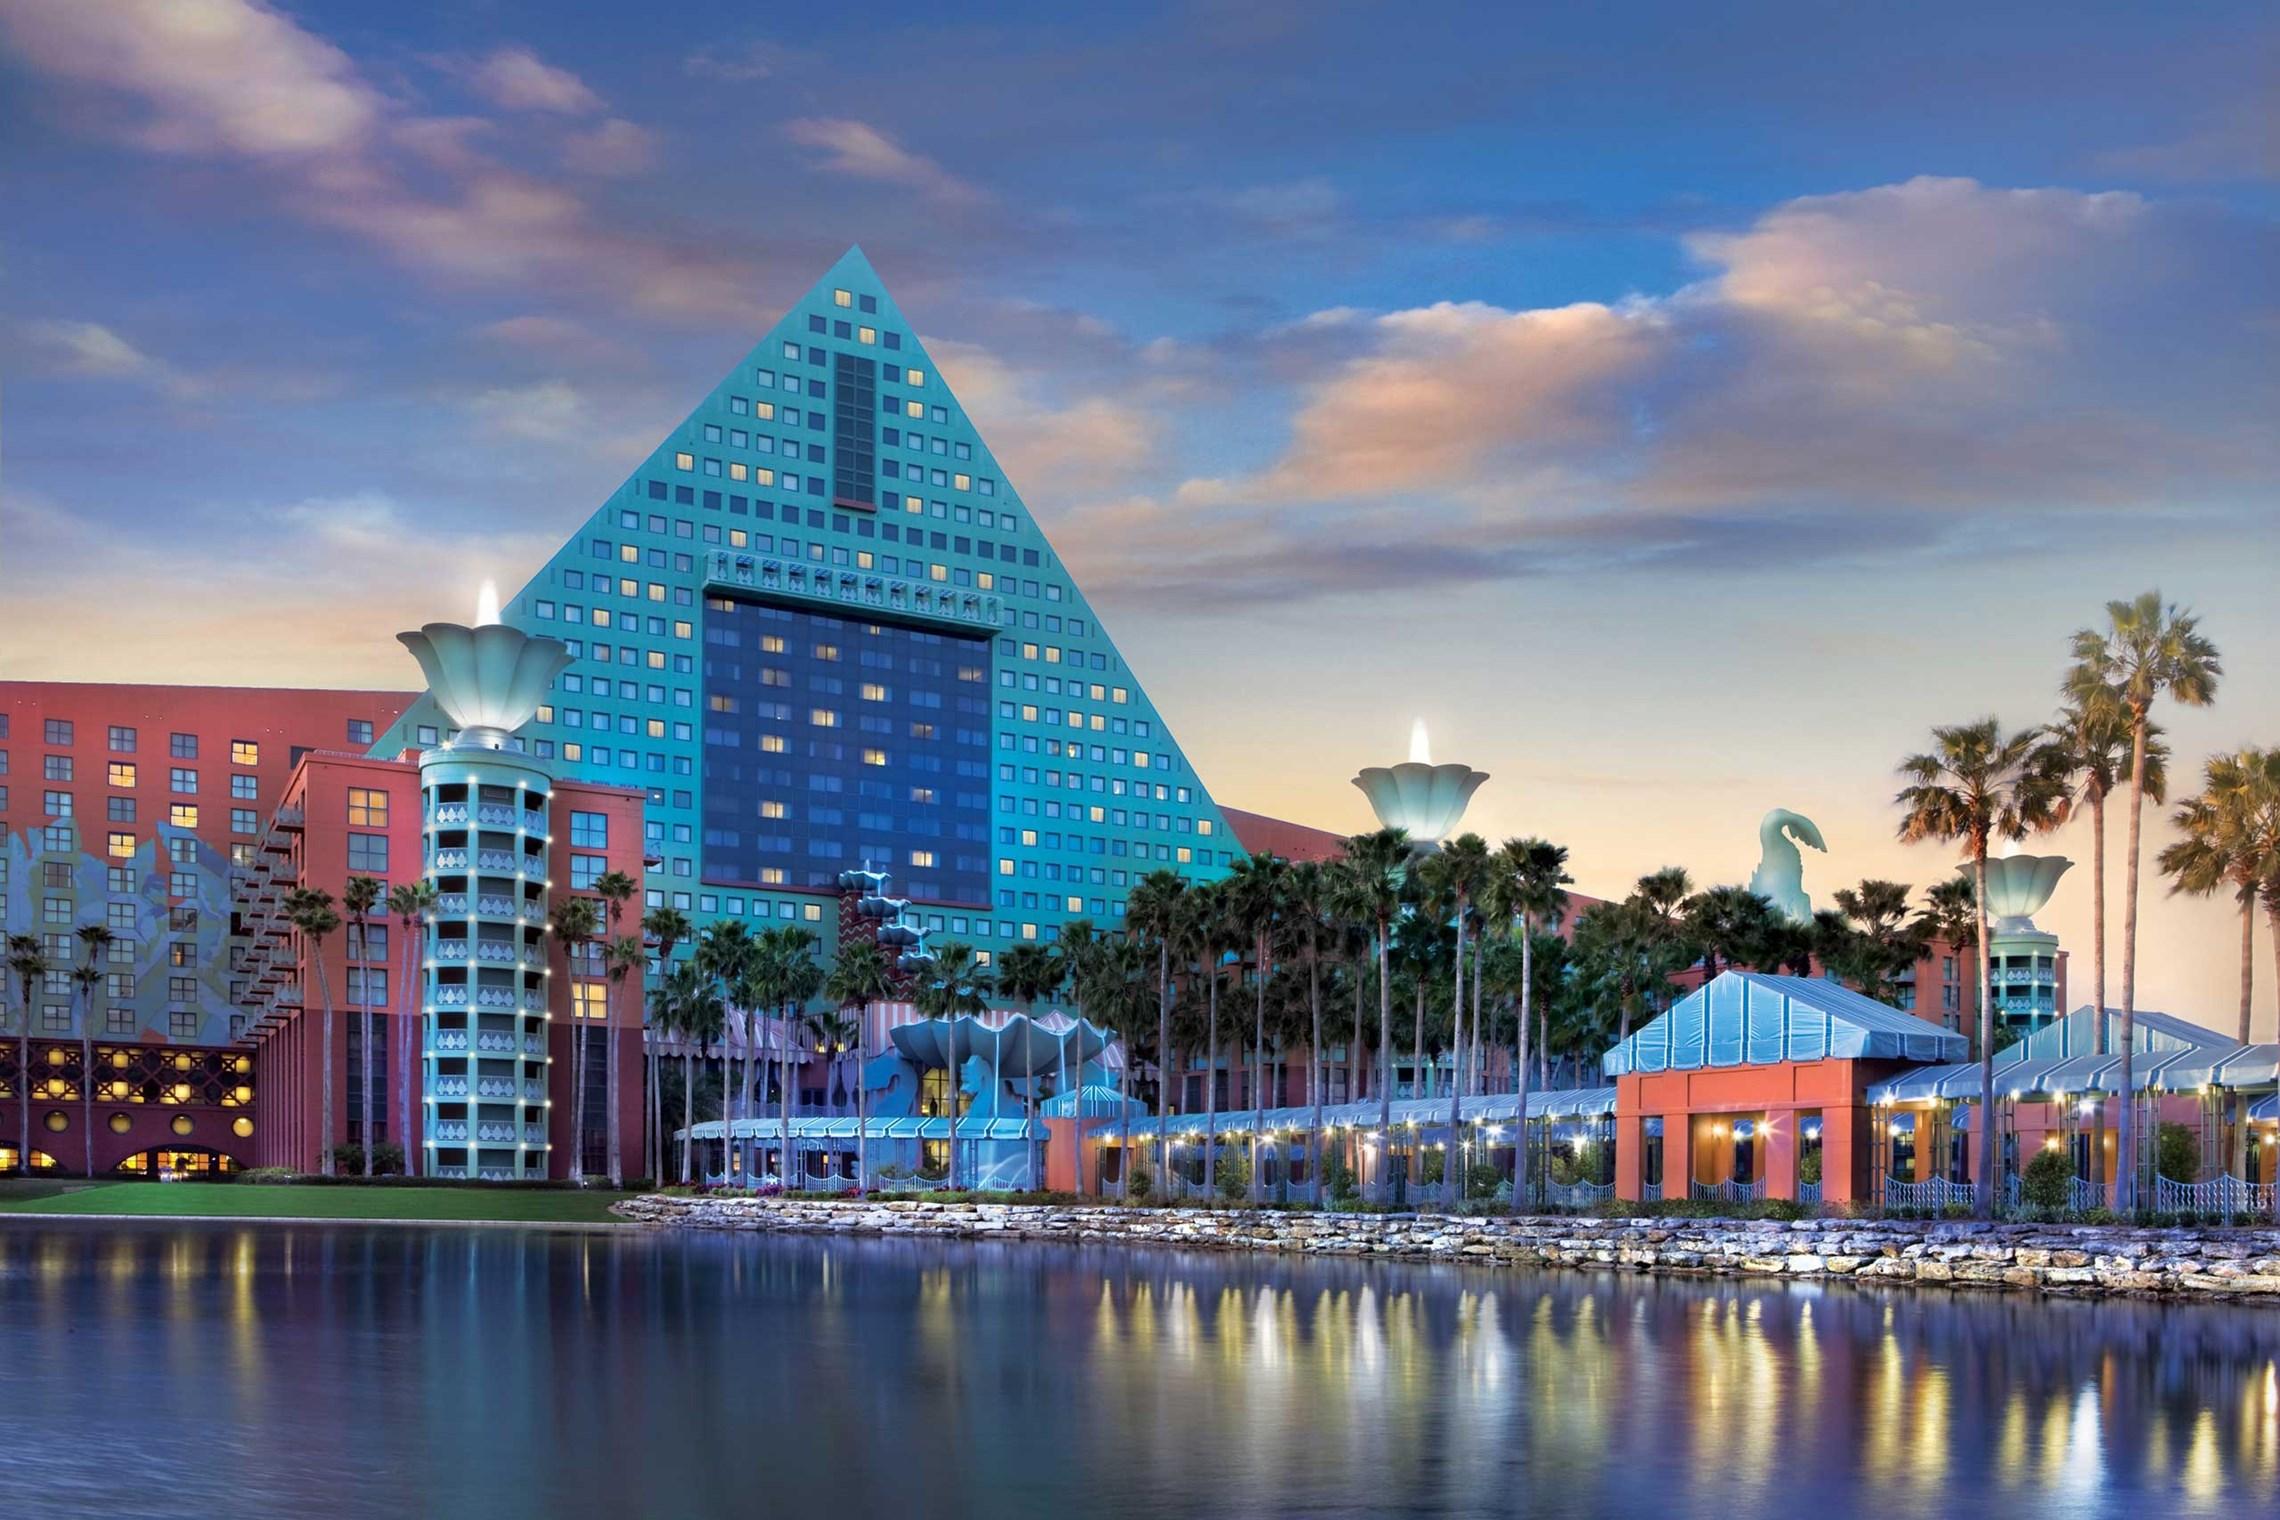 Walt Disney World Dolphin overview